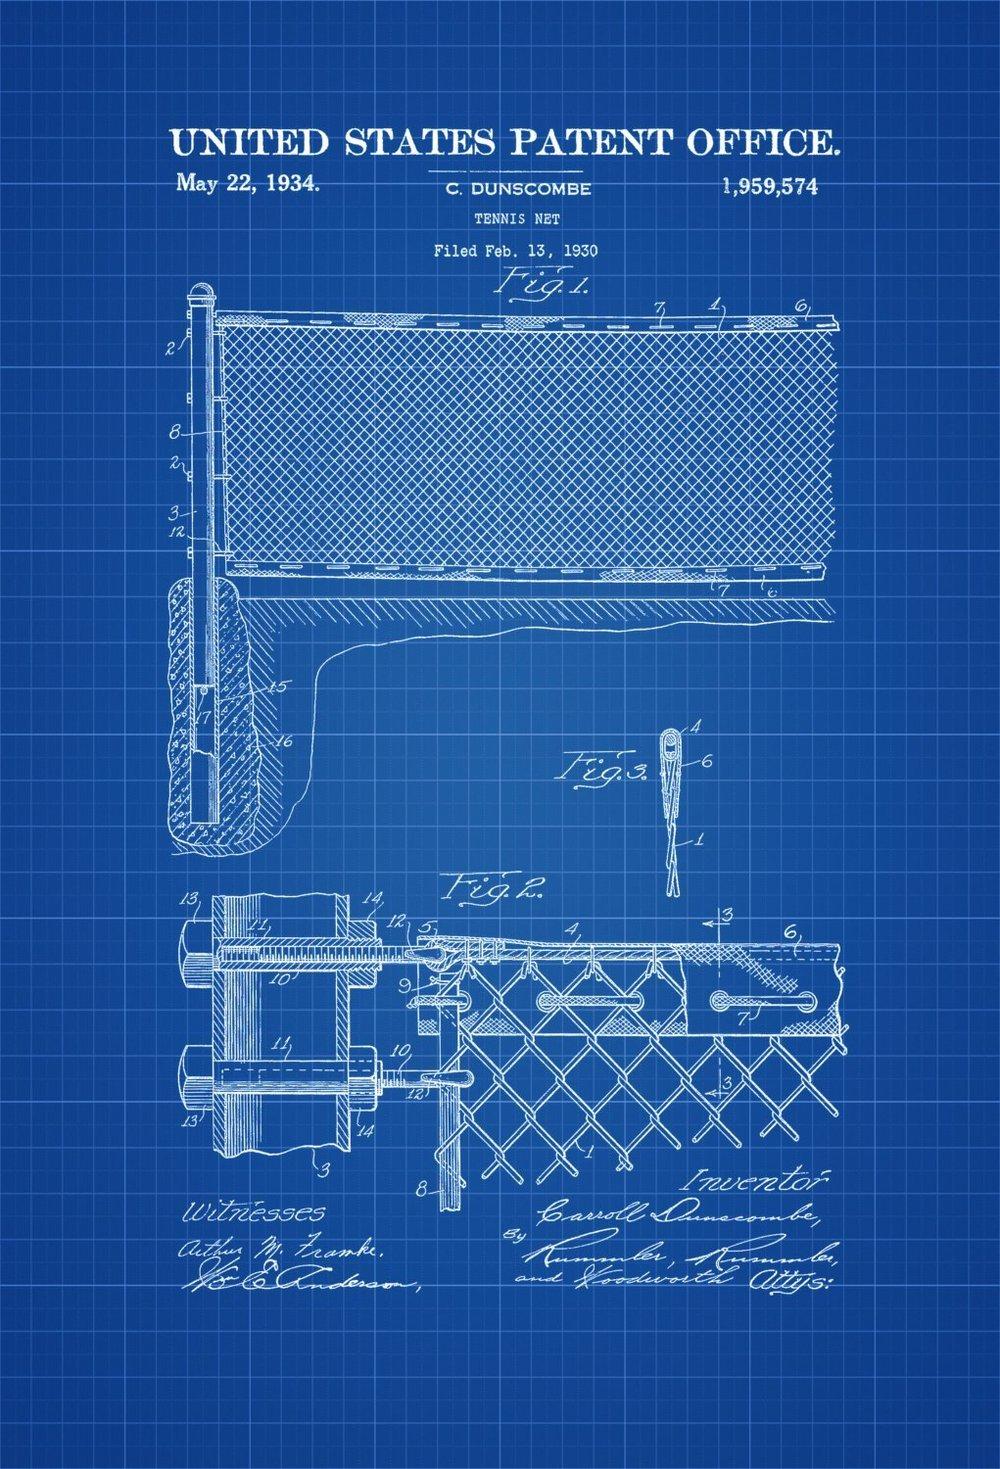 tennis-net-patent-1934-patent-print-wall-decor-vintage-tennis-tennis-art-tennis-patent-tennis-gift-58a2f67c4.jpg